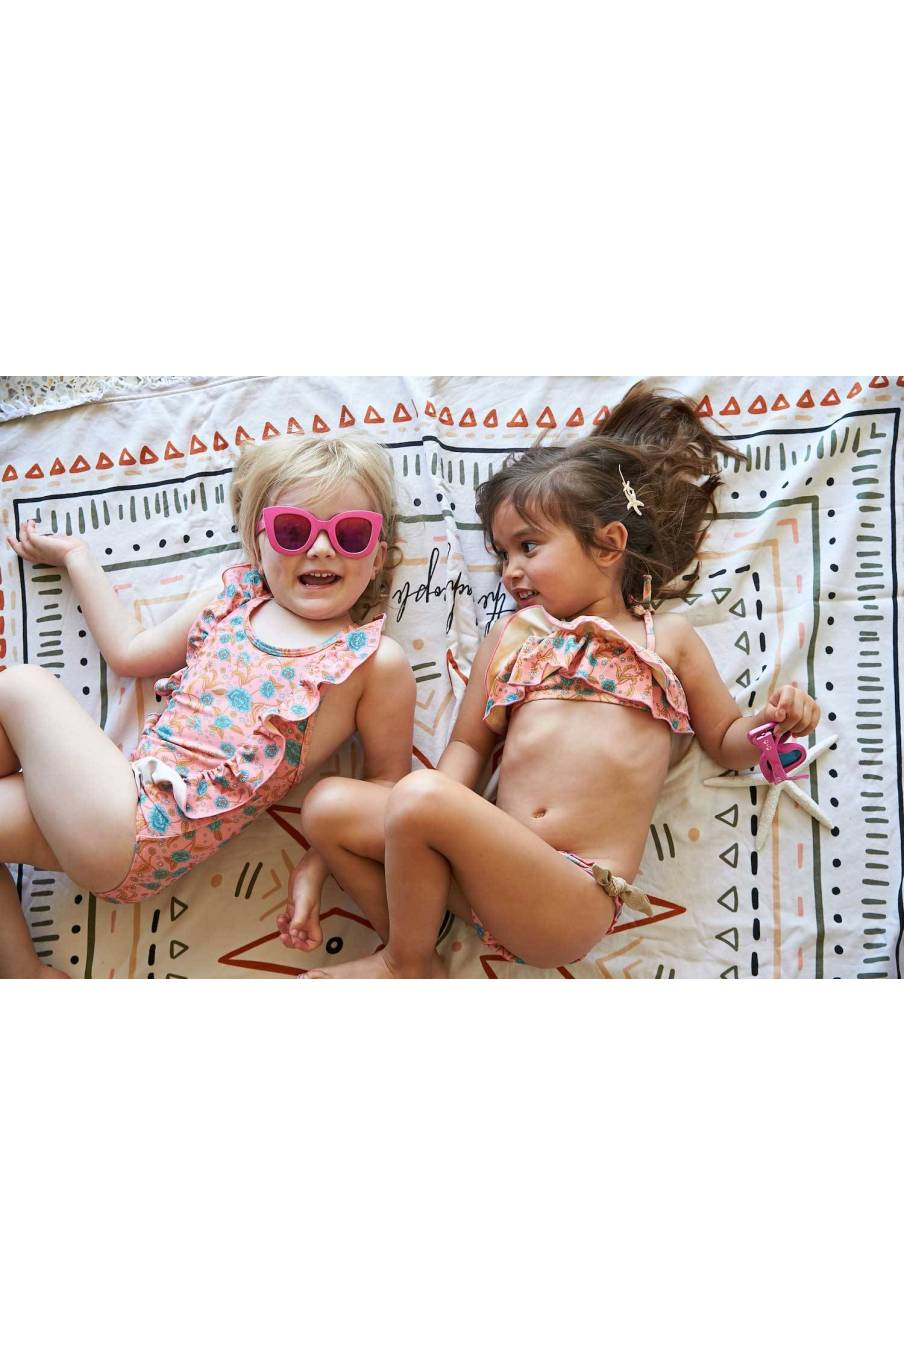 bikini bohème chic vintage  bébé fille fleurie zacata